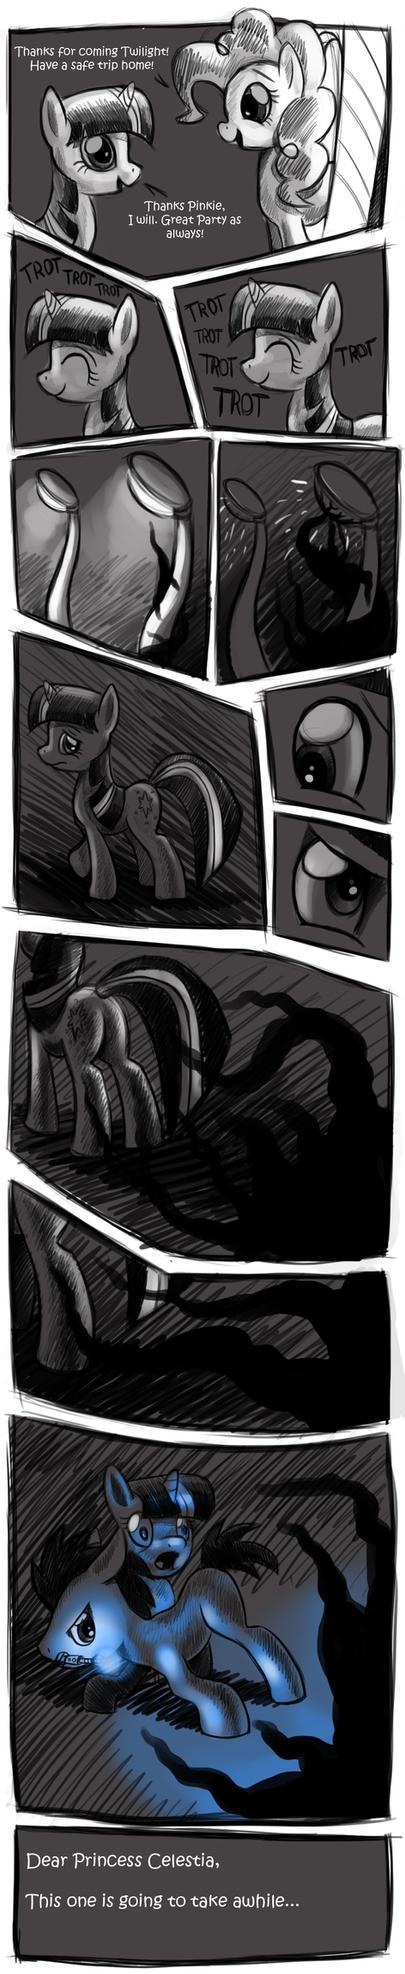 DOCTOR WHOOF  Lunar Shadow 1 by CyberToaster